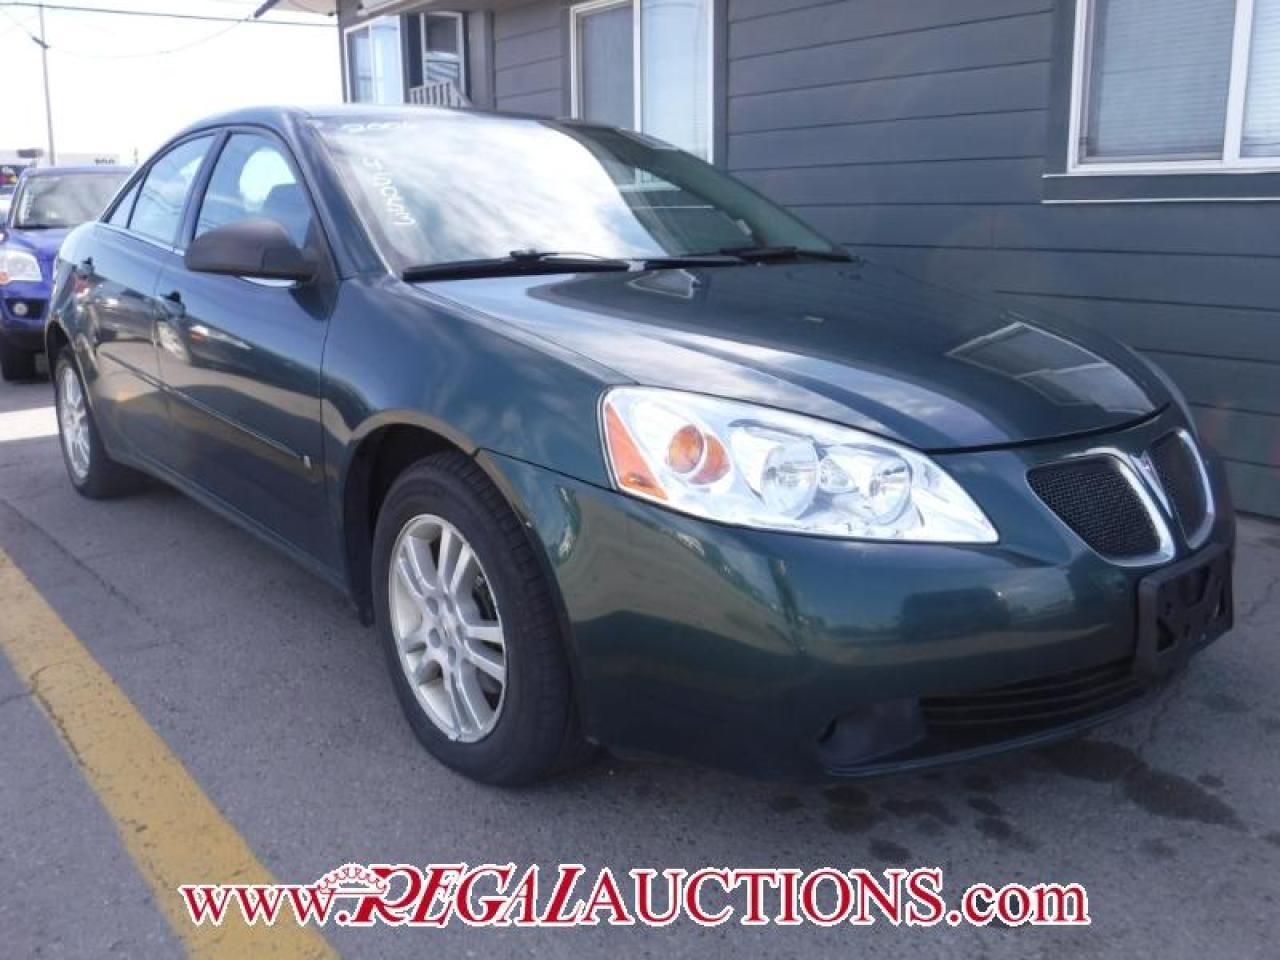 Photo of Green 2006 Pontiac G6